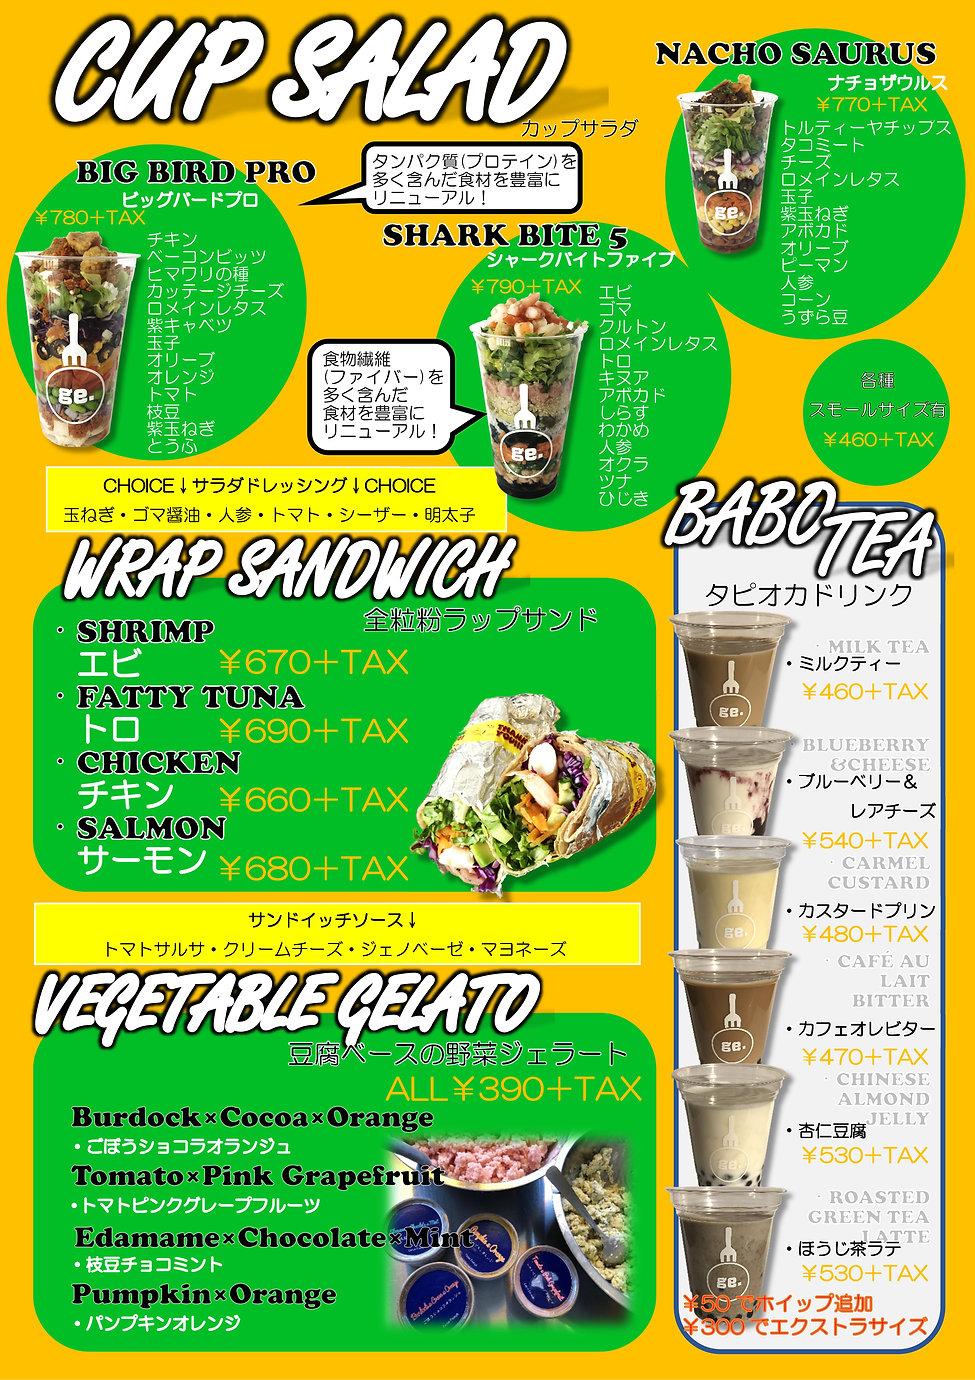 Greenenough menu.jpg